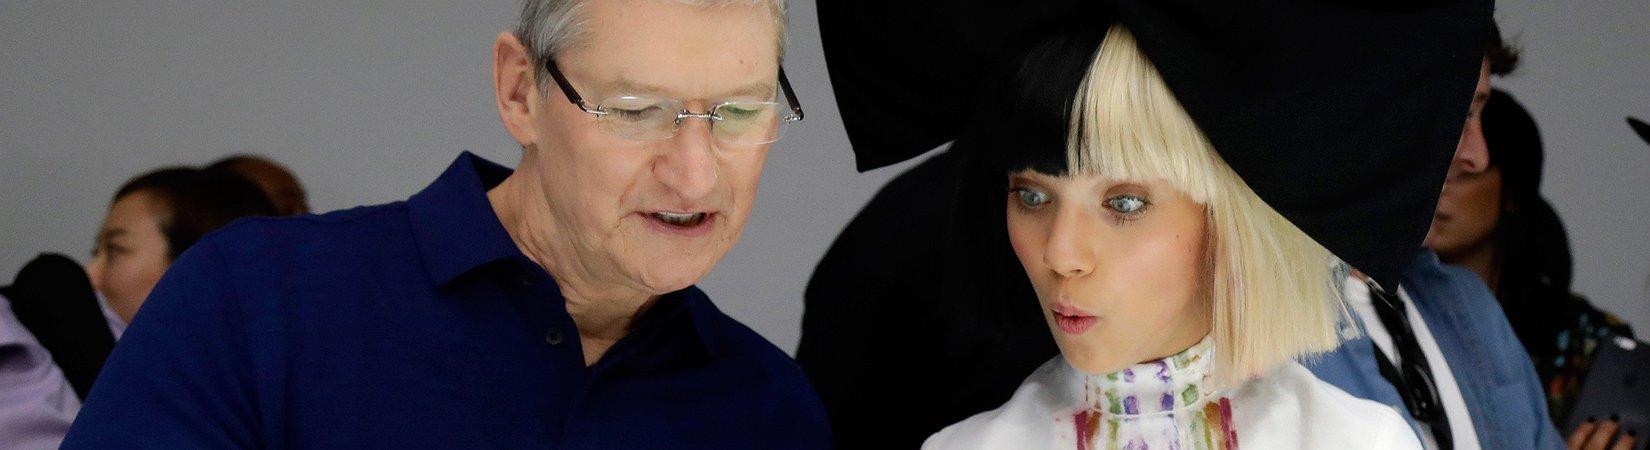 "Goldman Sachs suggests Apple explore content and launch ""Apple Prime"""